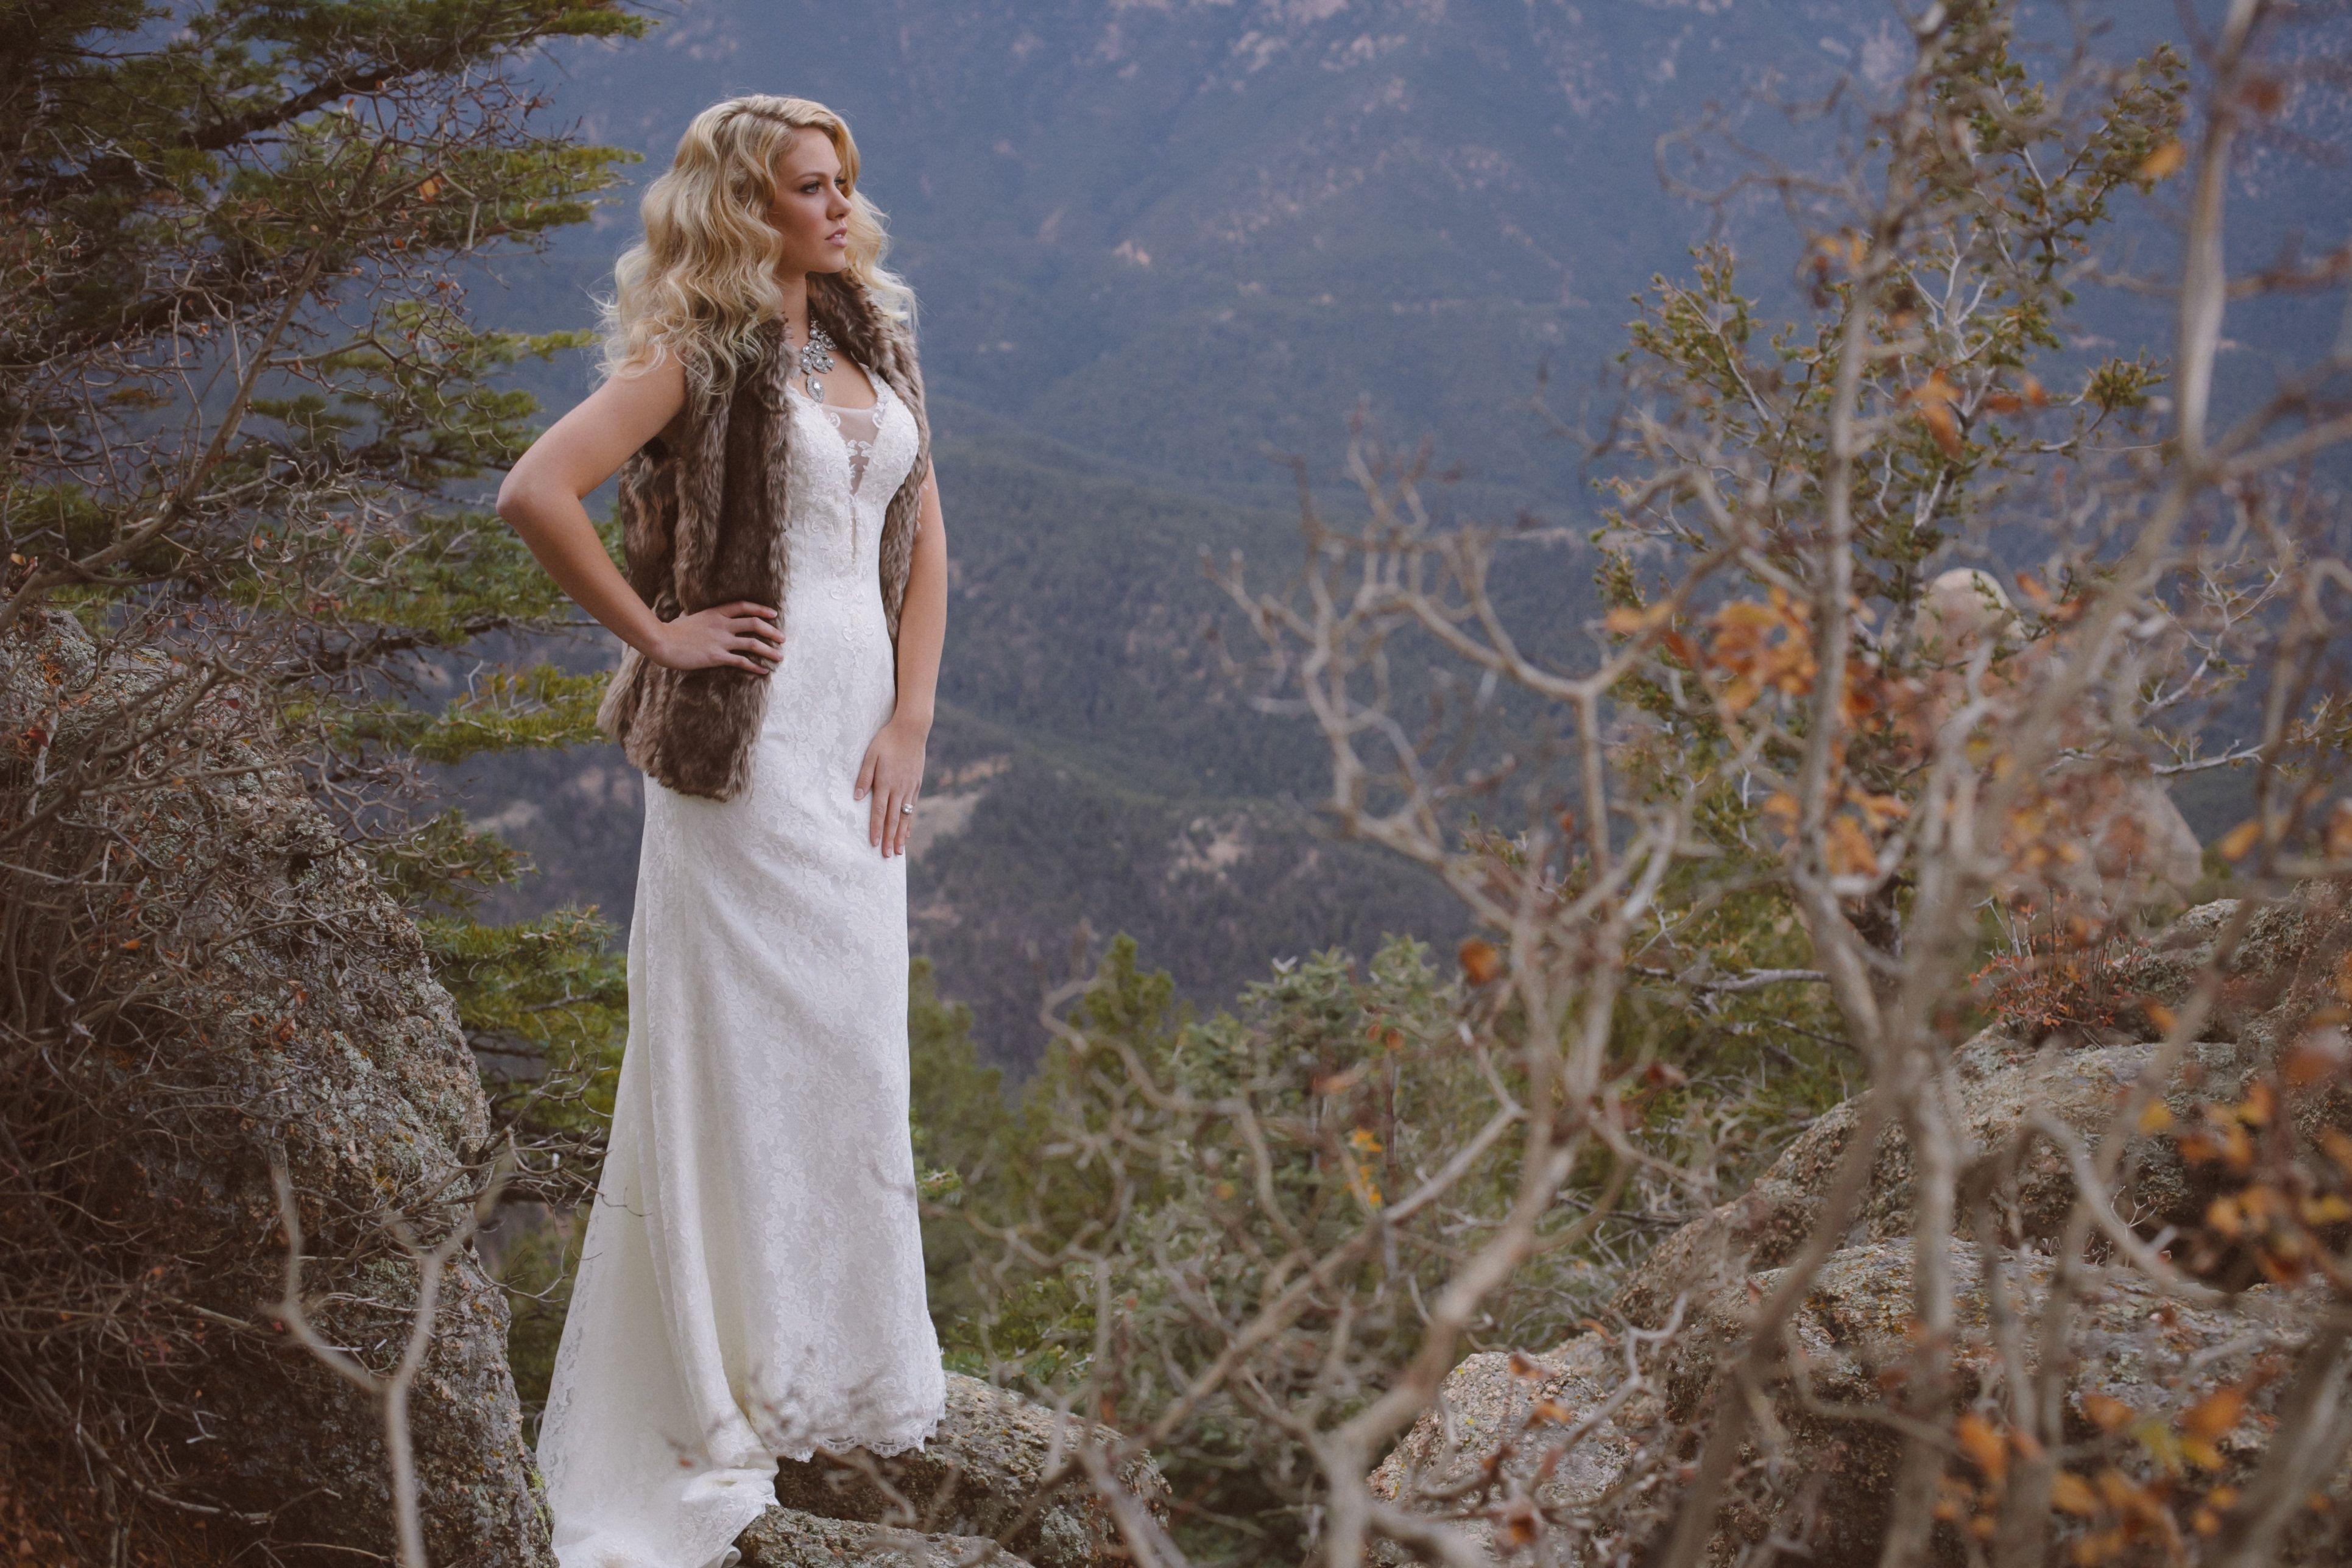 Divina Wedding Dresses at The Broadmoor Cloud Camp | Divina Wedding ...